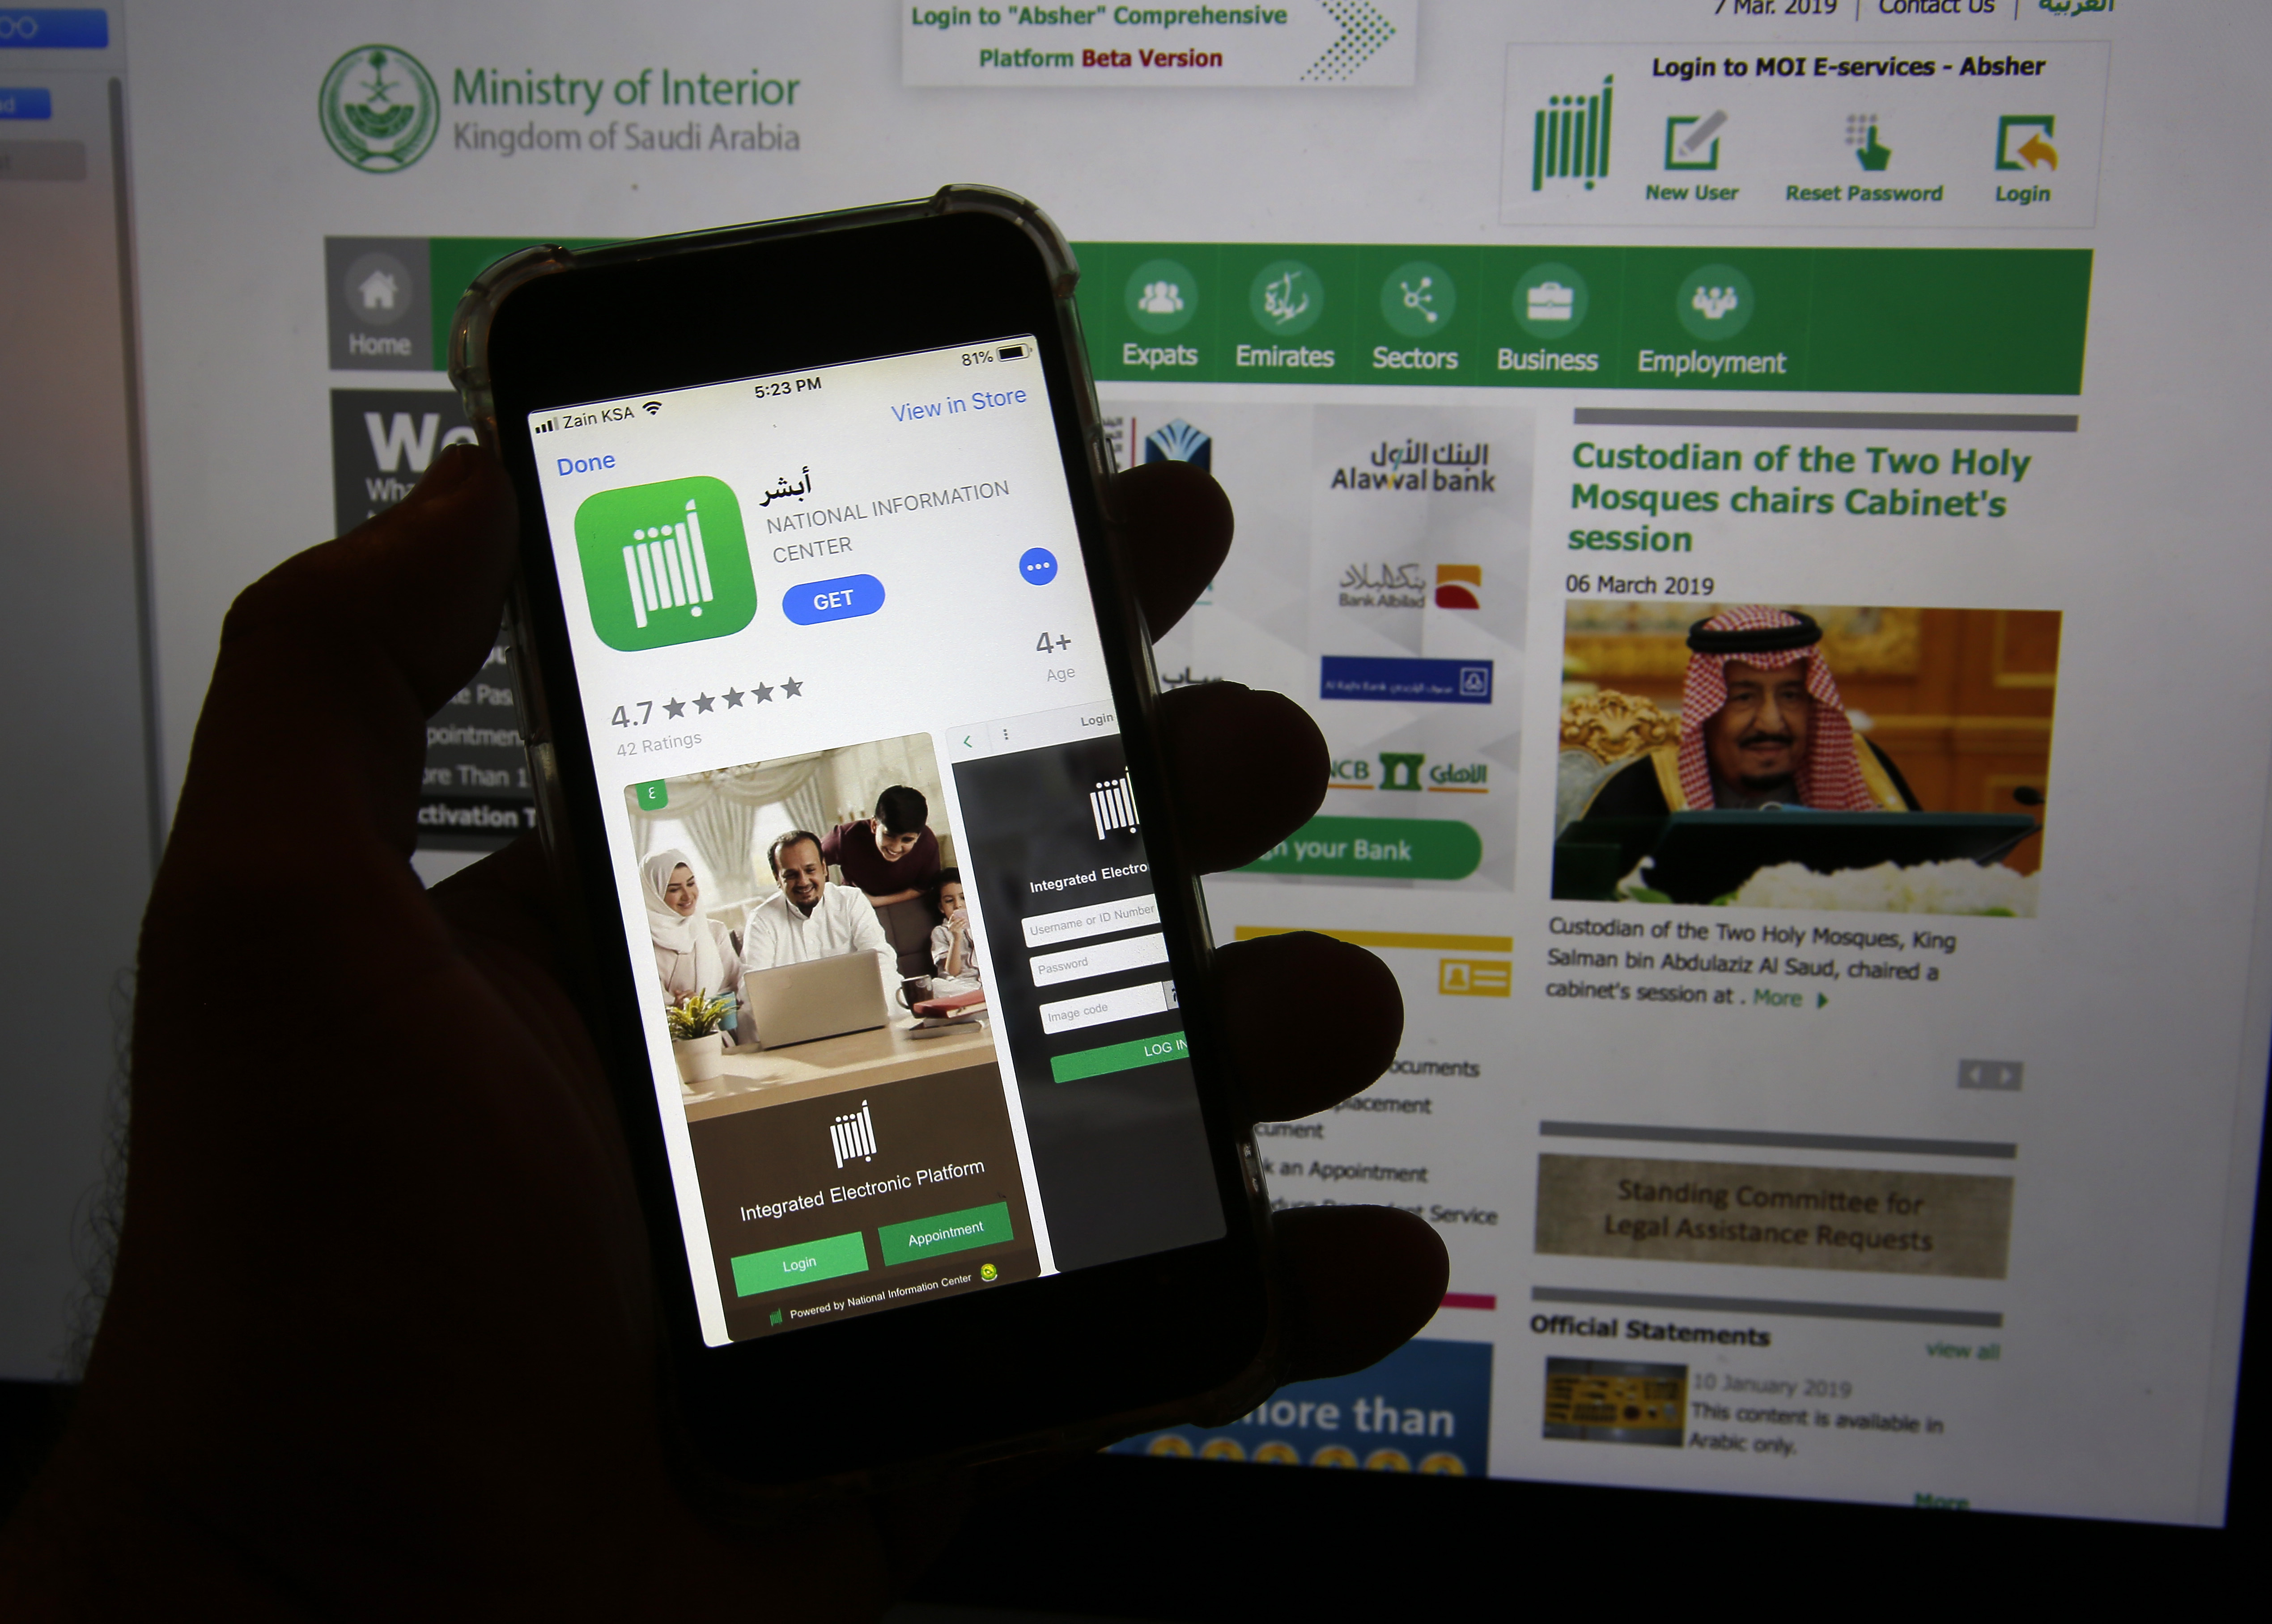 The Absher app is seen on a phone in Jiddah, Saudi Arabia on March 7, 2019.